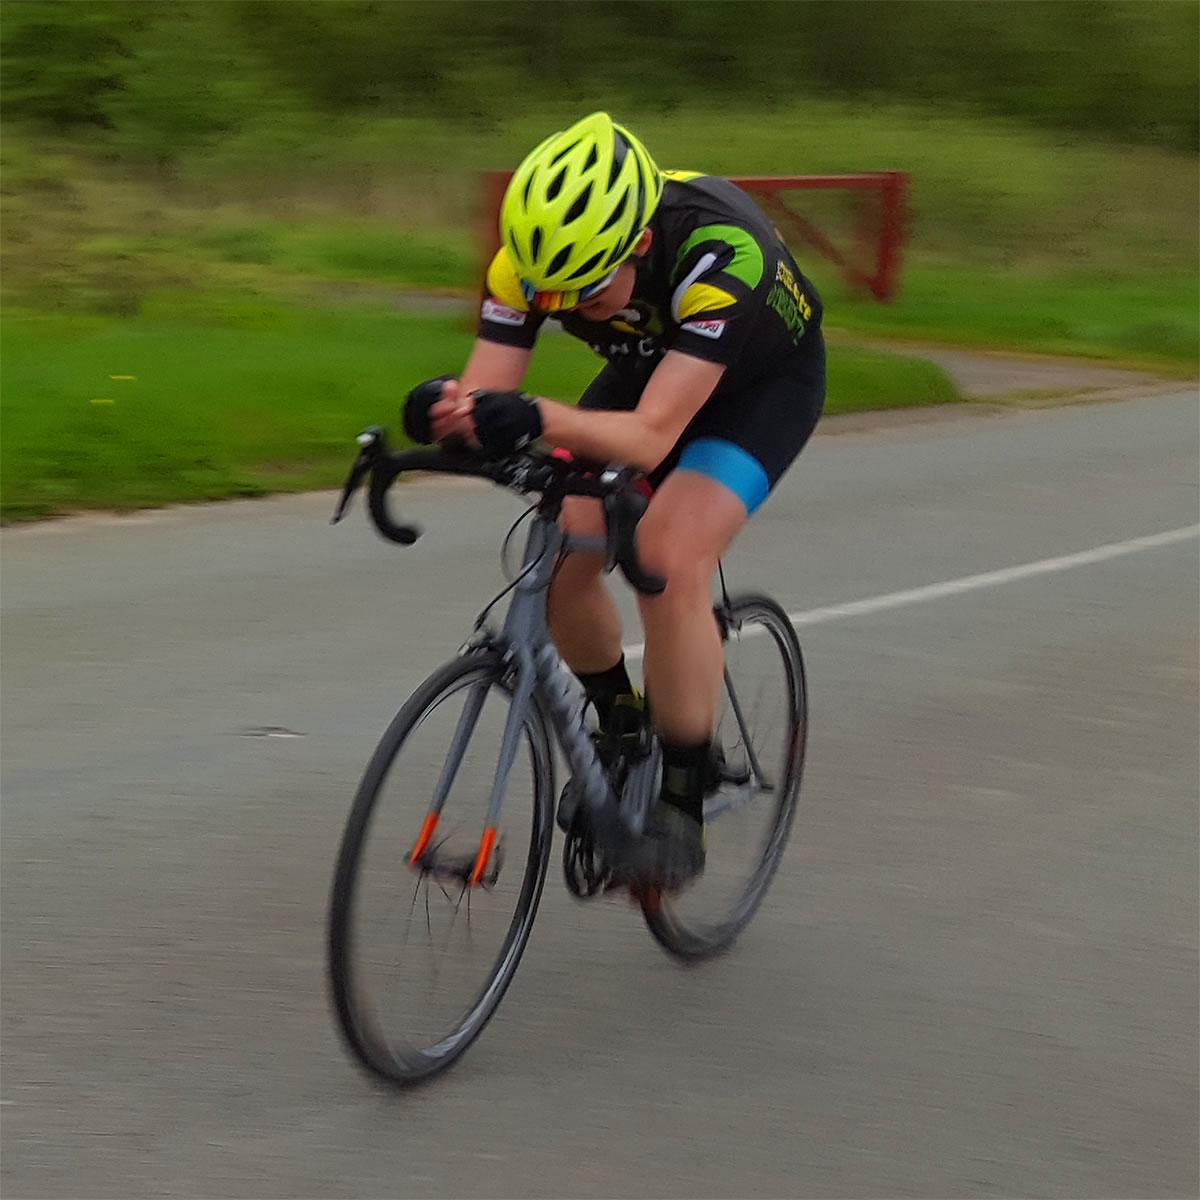 runcorn cycle club time trial rider 1